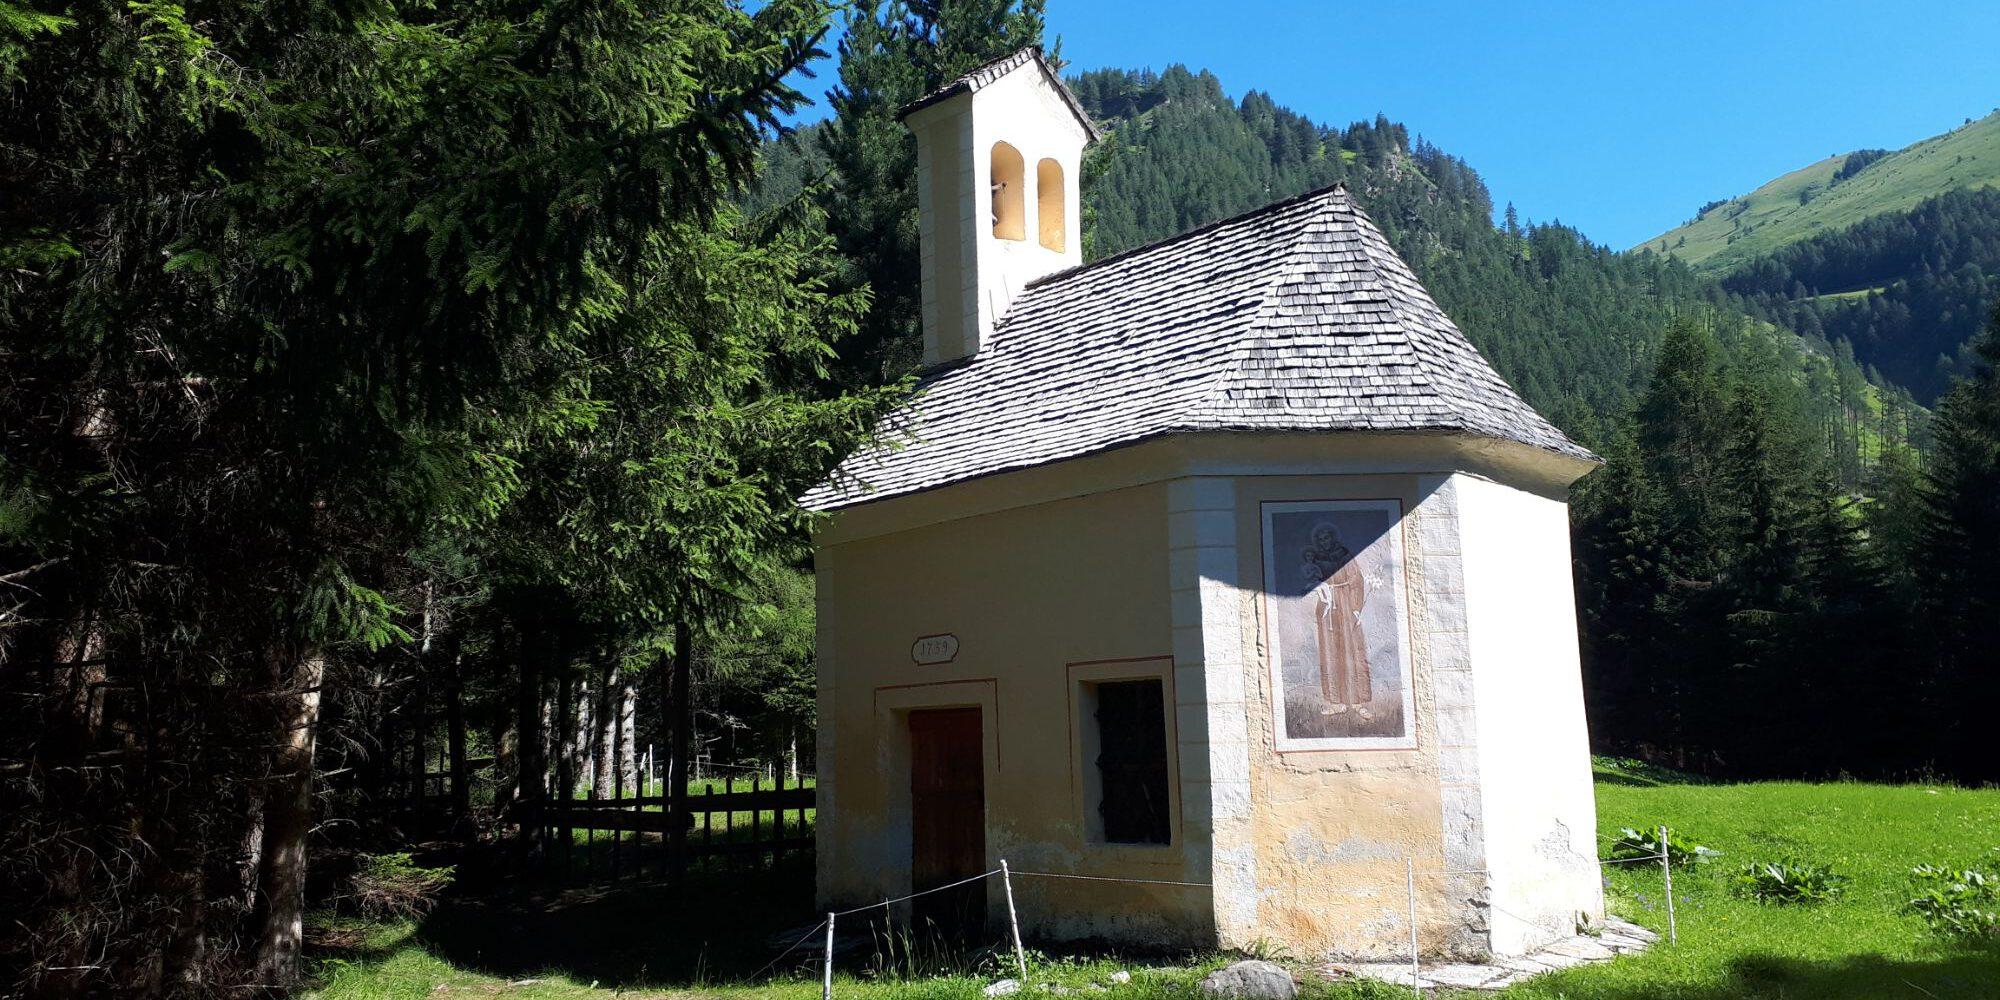 Alpe Adria Trail Etappe 2